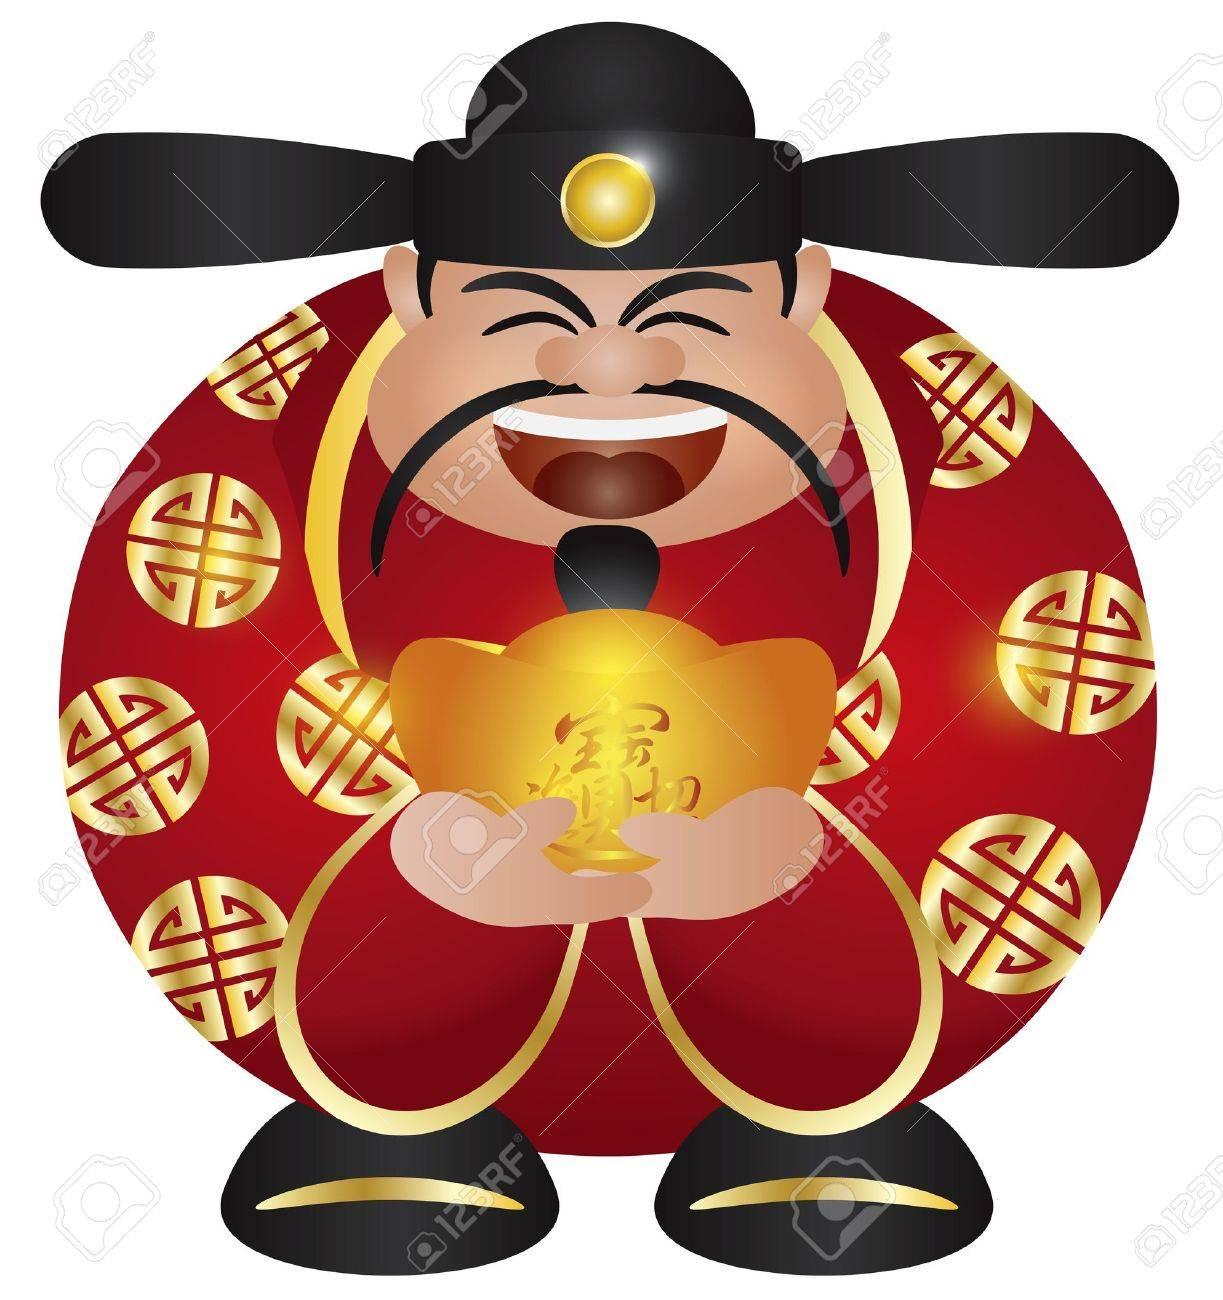 Happy Chinese Lunar New Year Prosperity Money God Holding Gold Bar Illustration Isolated on White Background Stock Vector - 16729390